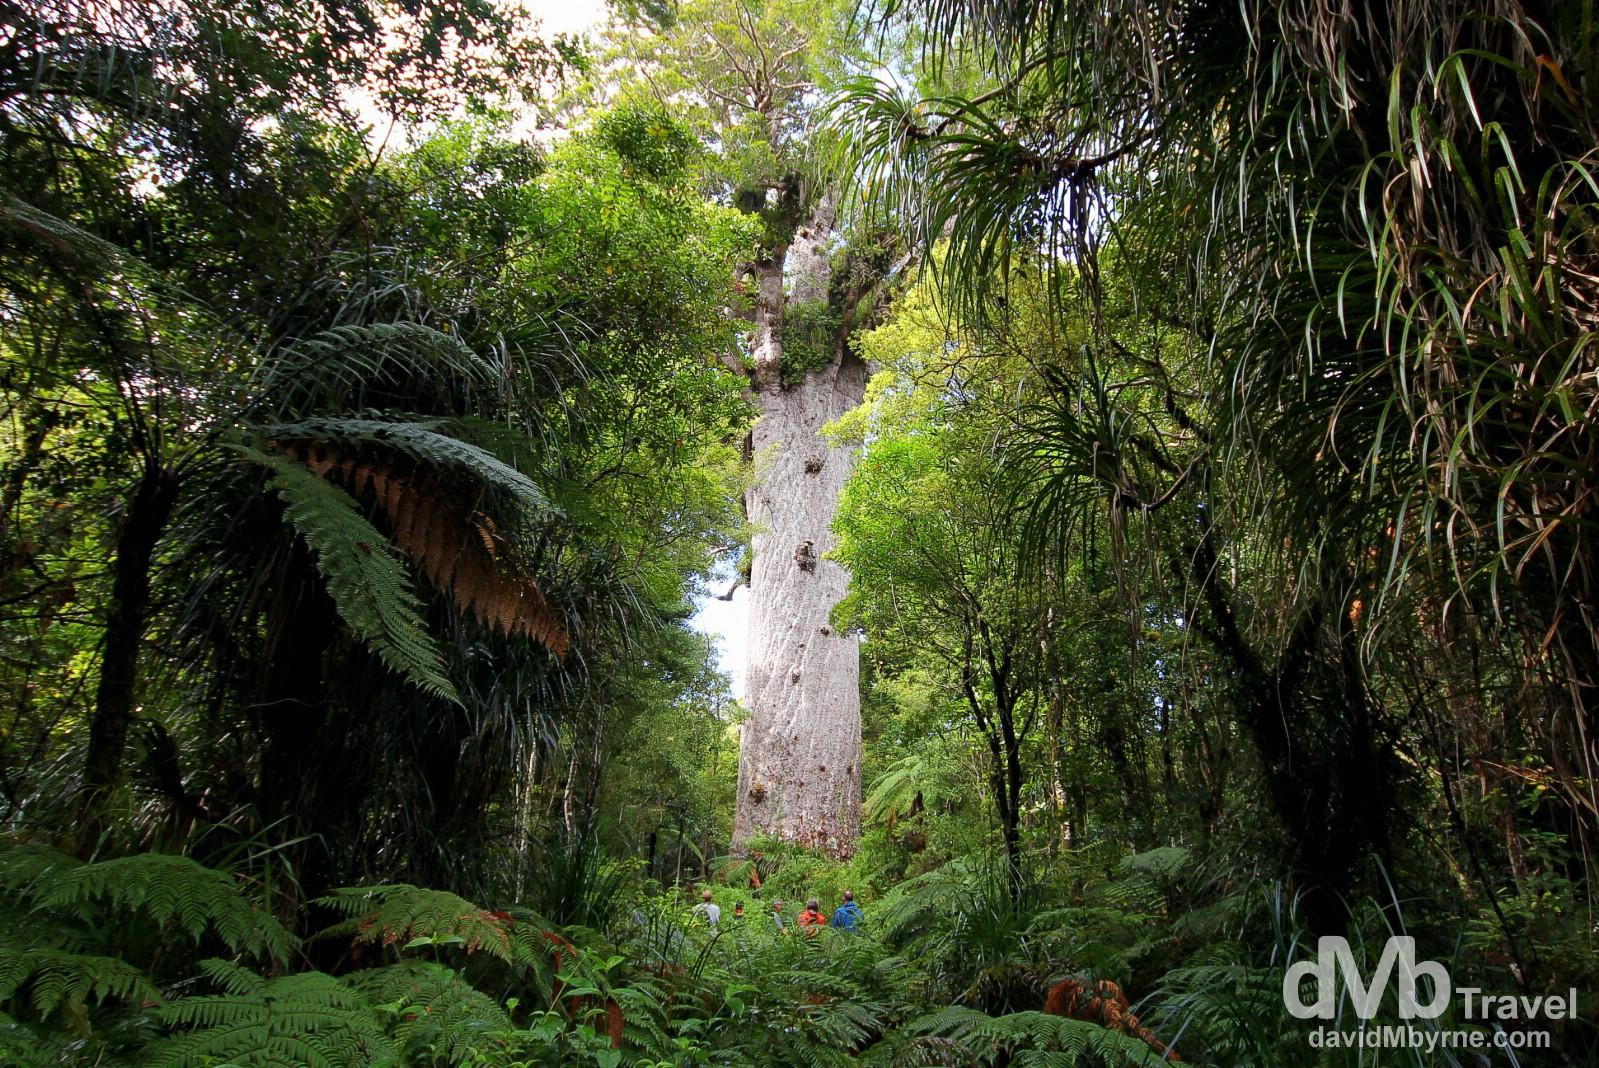 Tane Mahuta, Waipoua Kauri Forest, North Island, New Zealand. May 1st 2012.